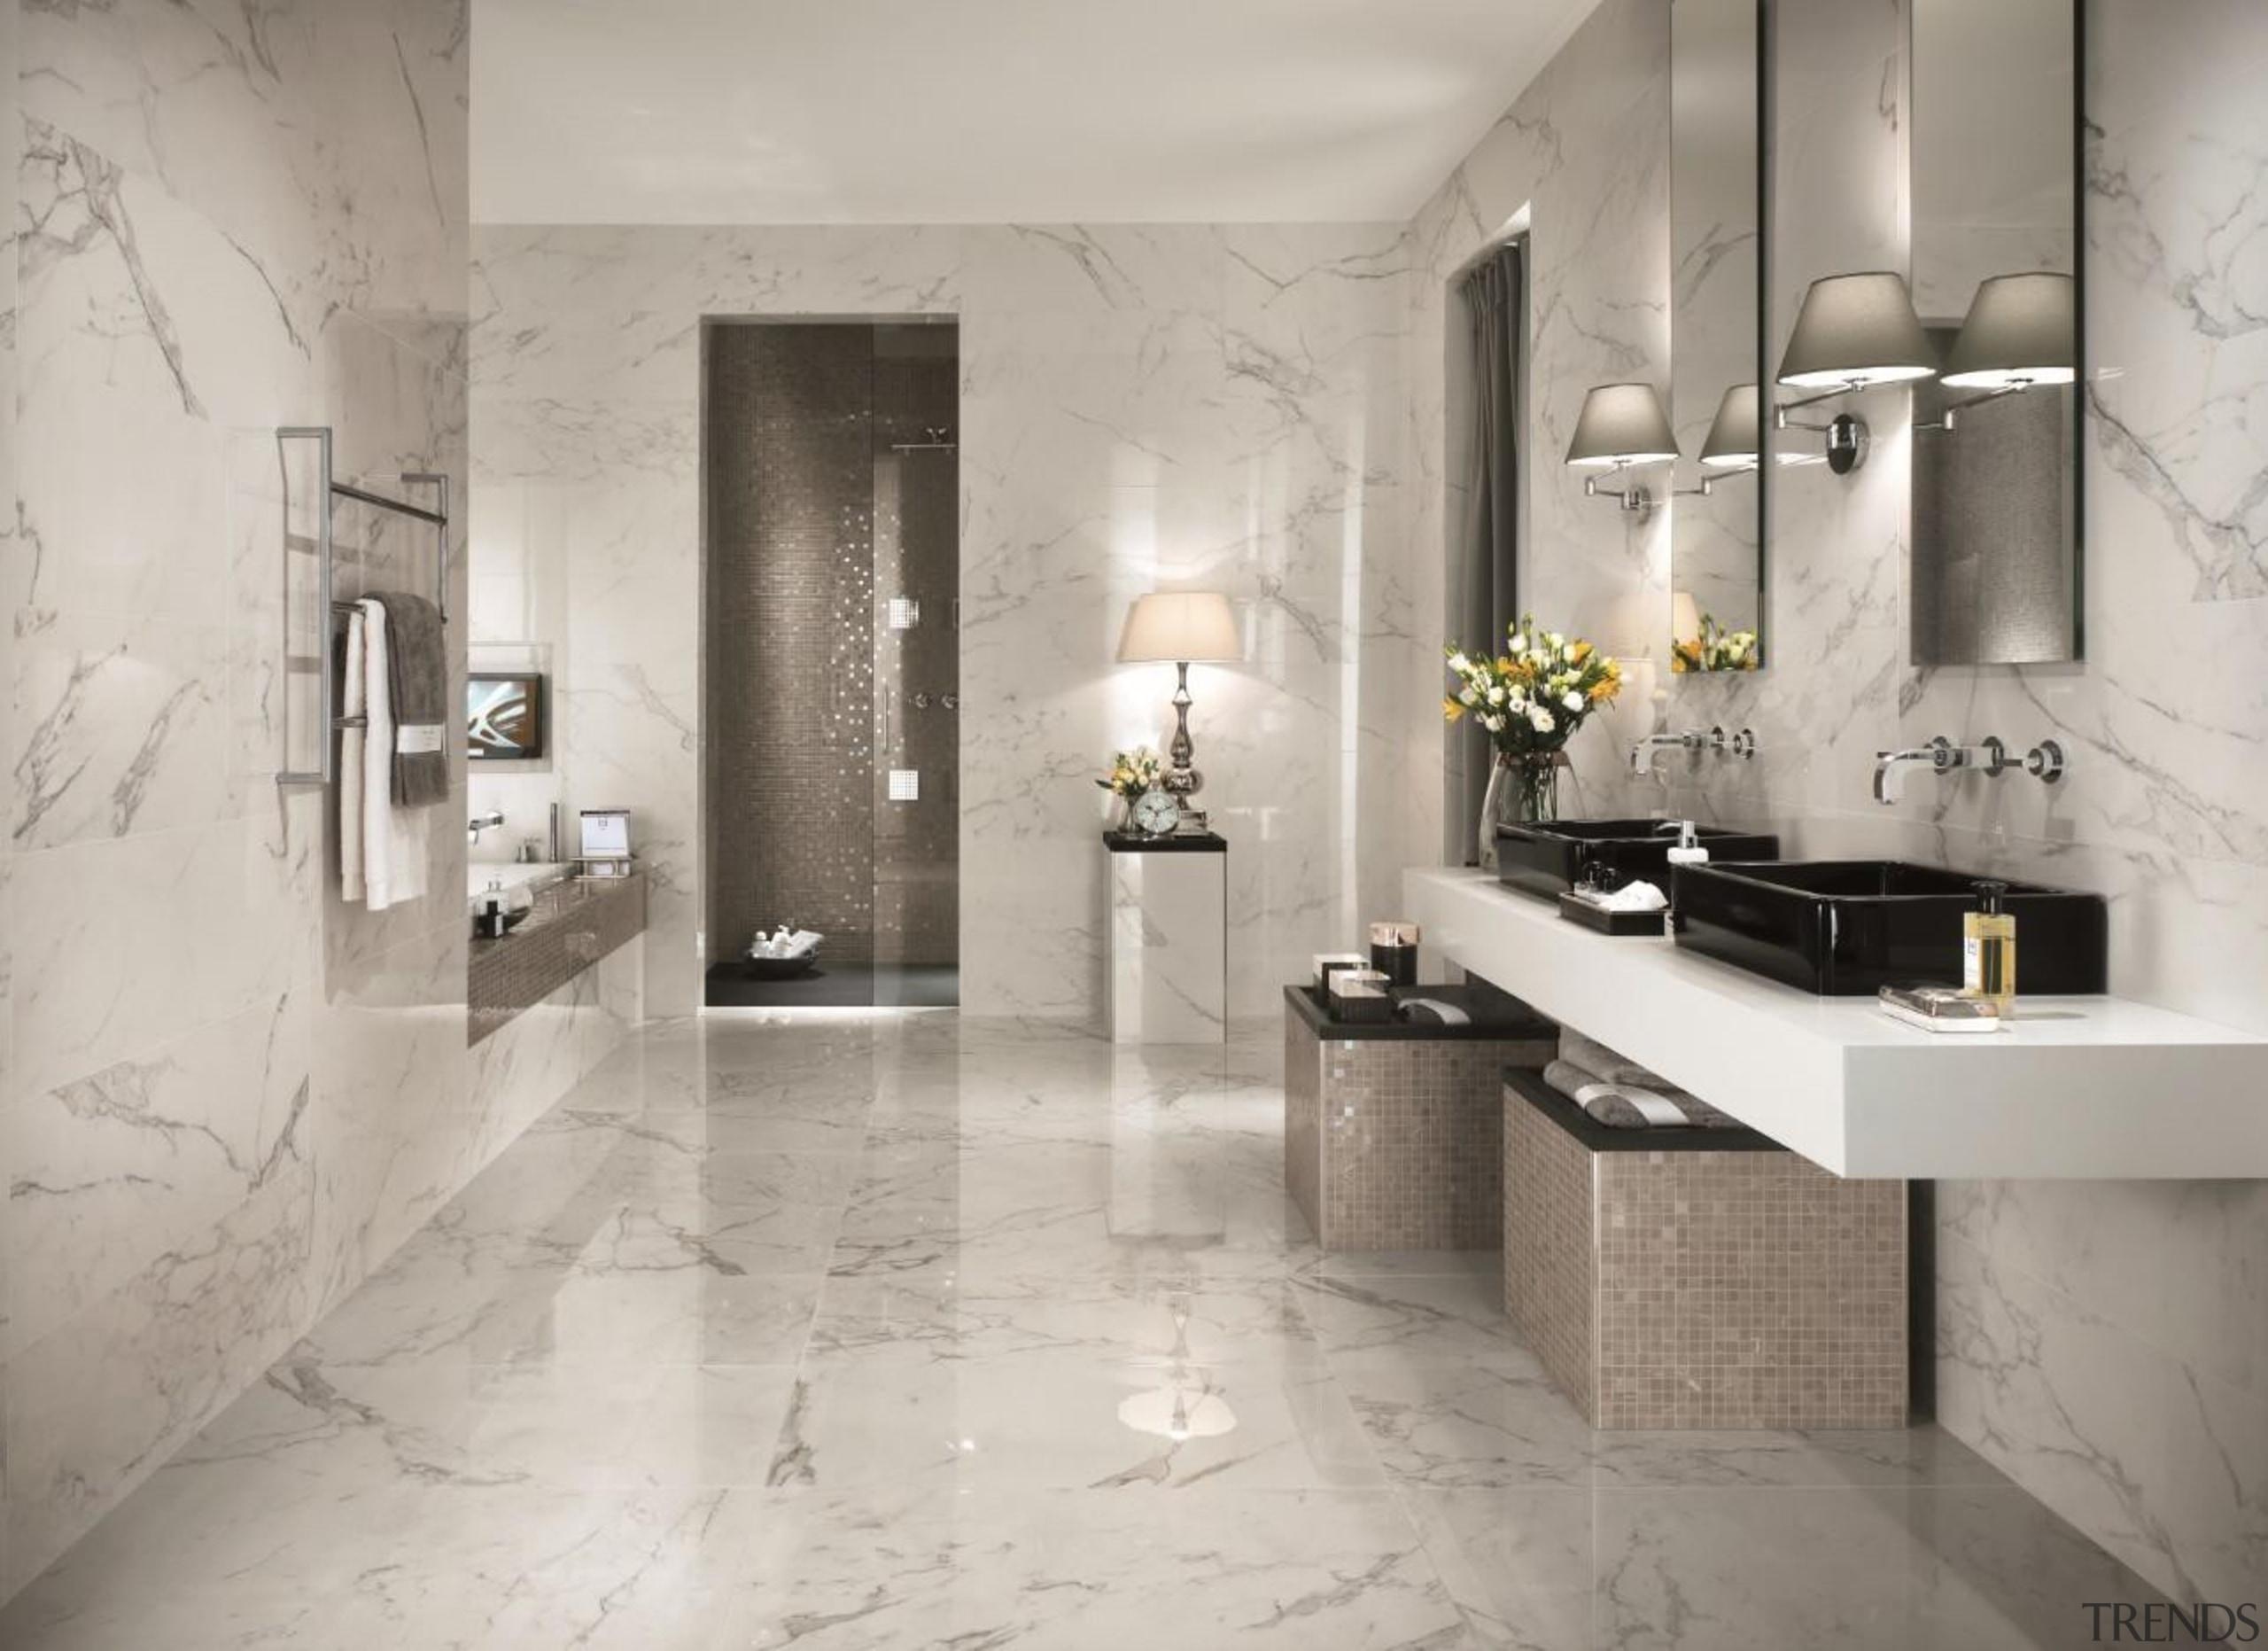 Calacatta bathroom tiles - Cb 9201375049970453 - bathroom bathroom, countertop, floor, flooring, home, interior design, room, tap, tile, wall, gray